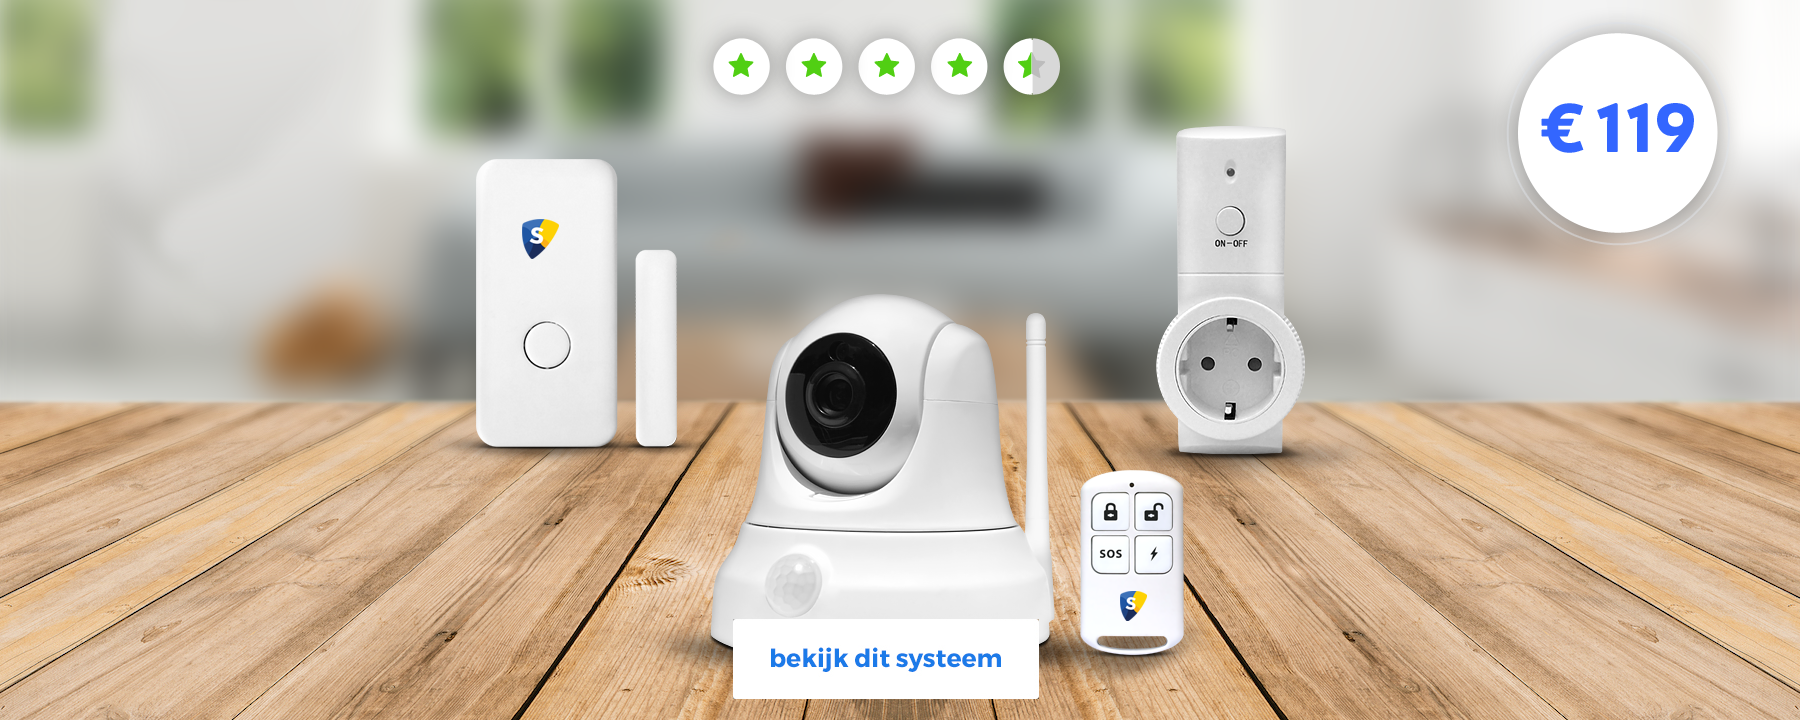 smart home beveiliging start pakket alarmsysteem